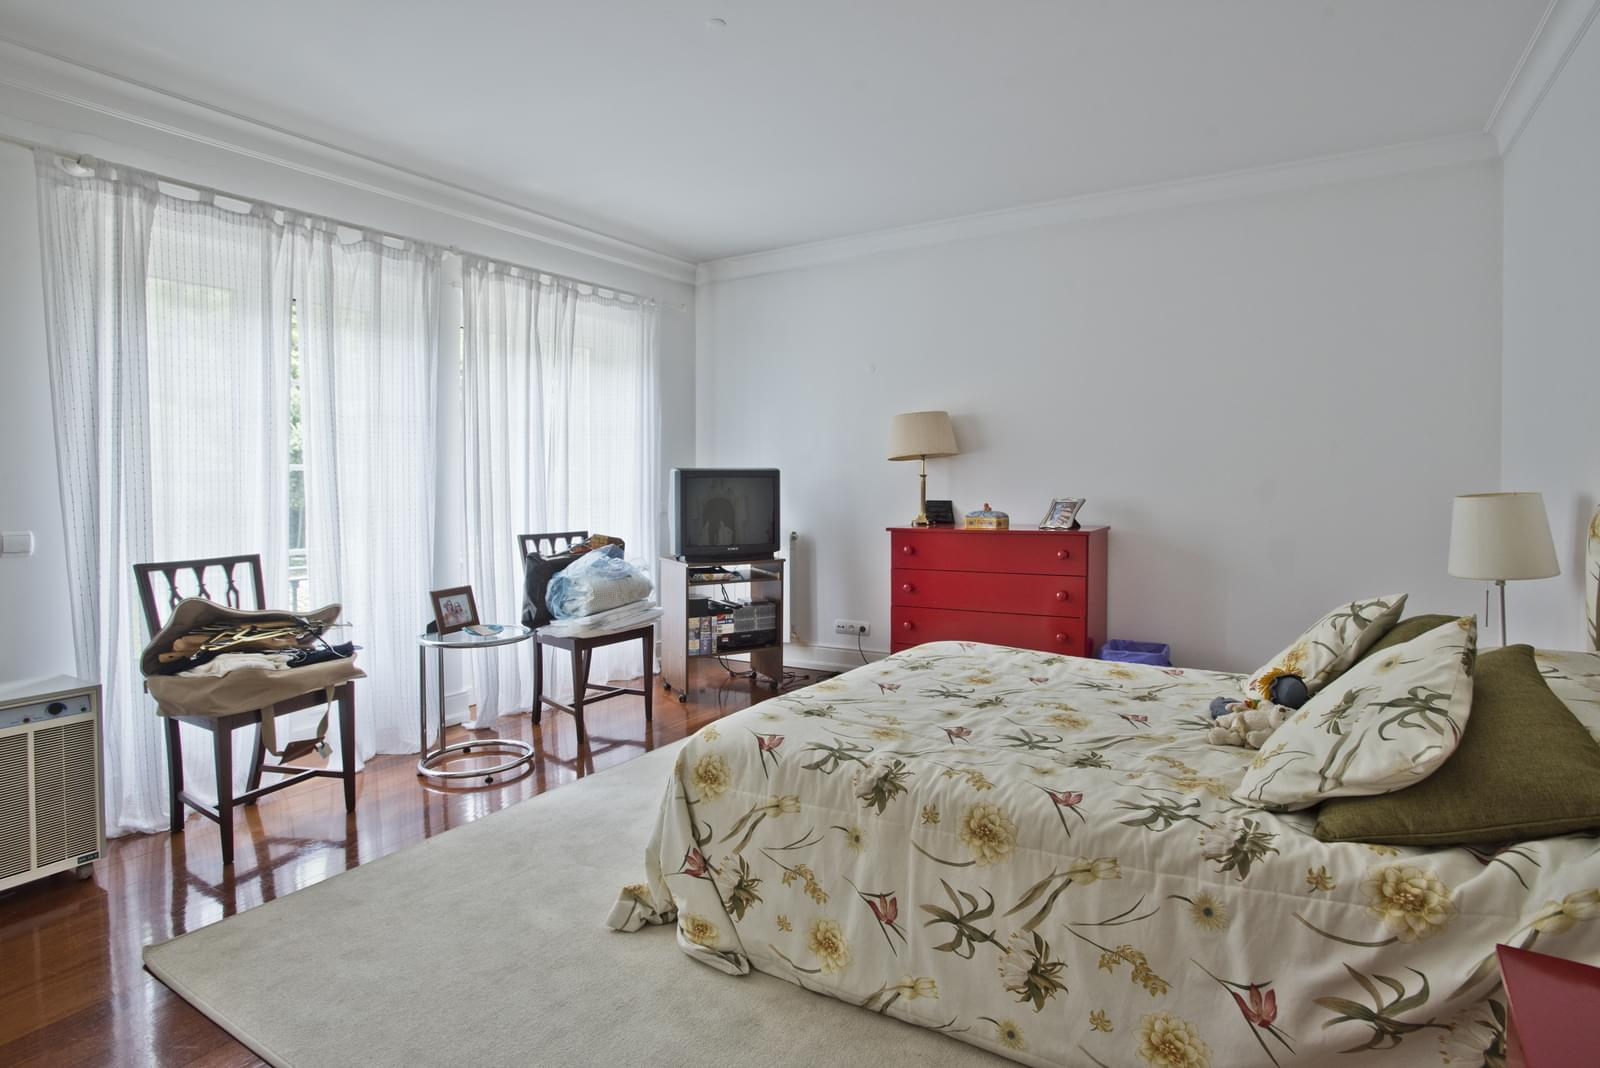 pf17005-apartamento-t4-1-cascais-67d11377-0e0f-4071-bb2a-a2eb7991ef1f